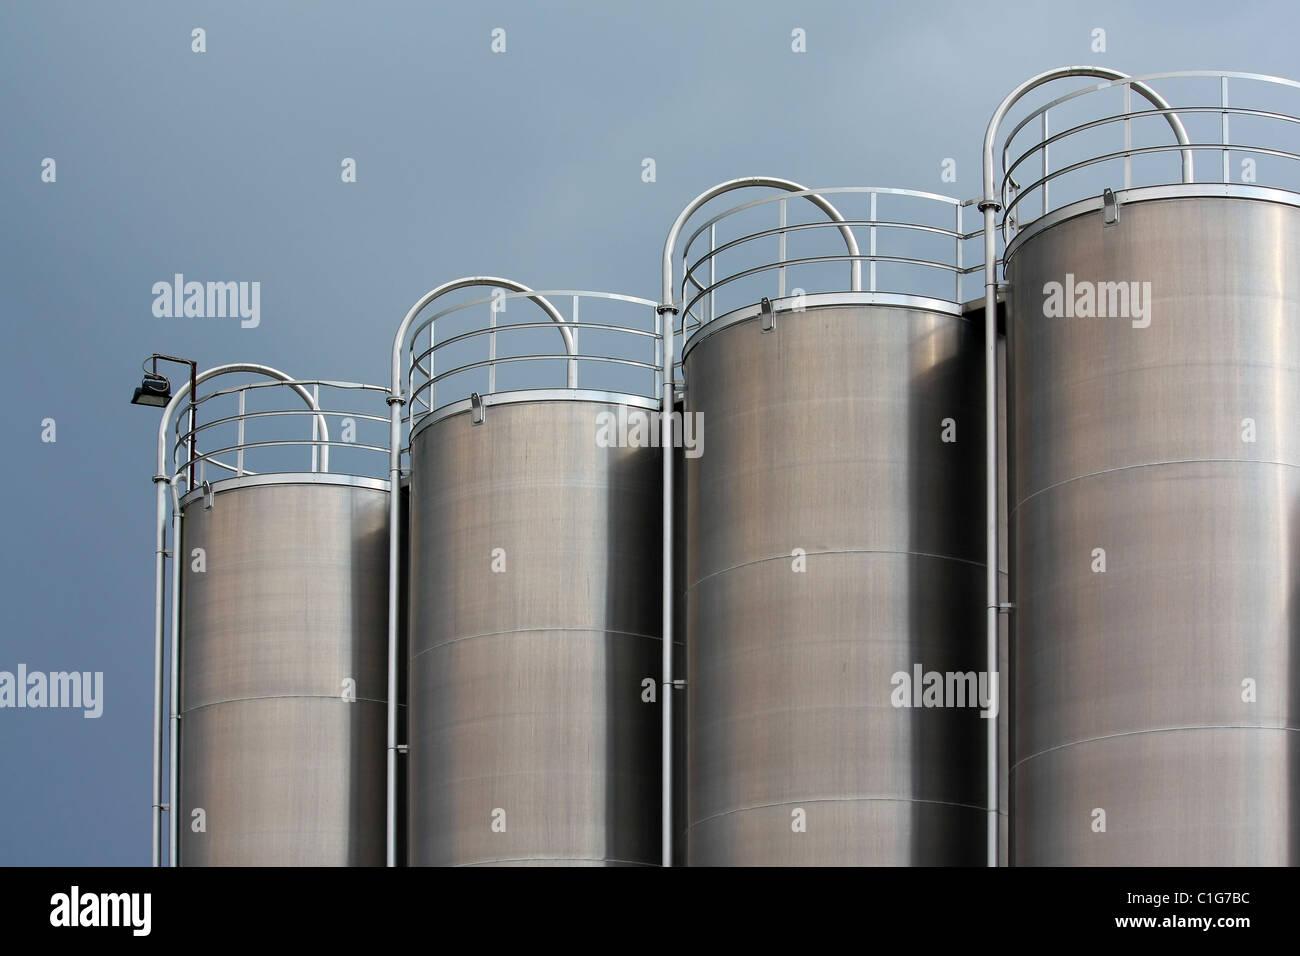 steel tanks - Stock Image